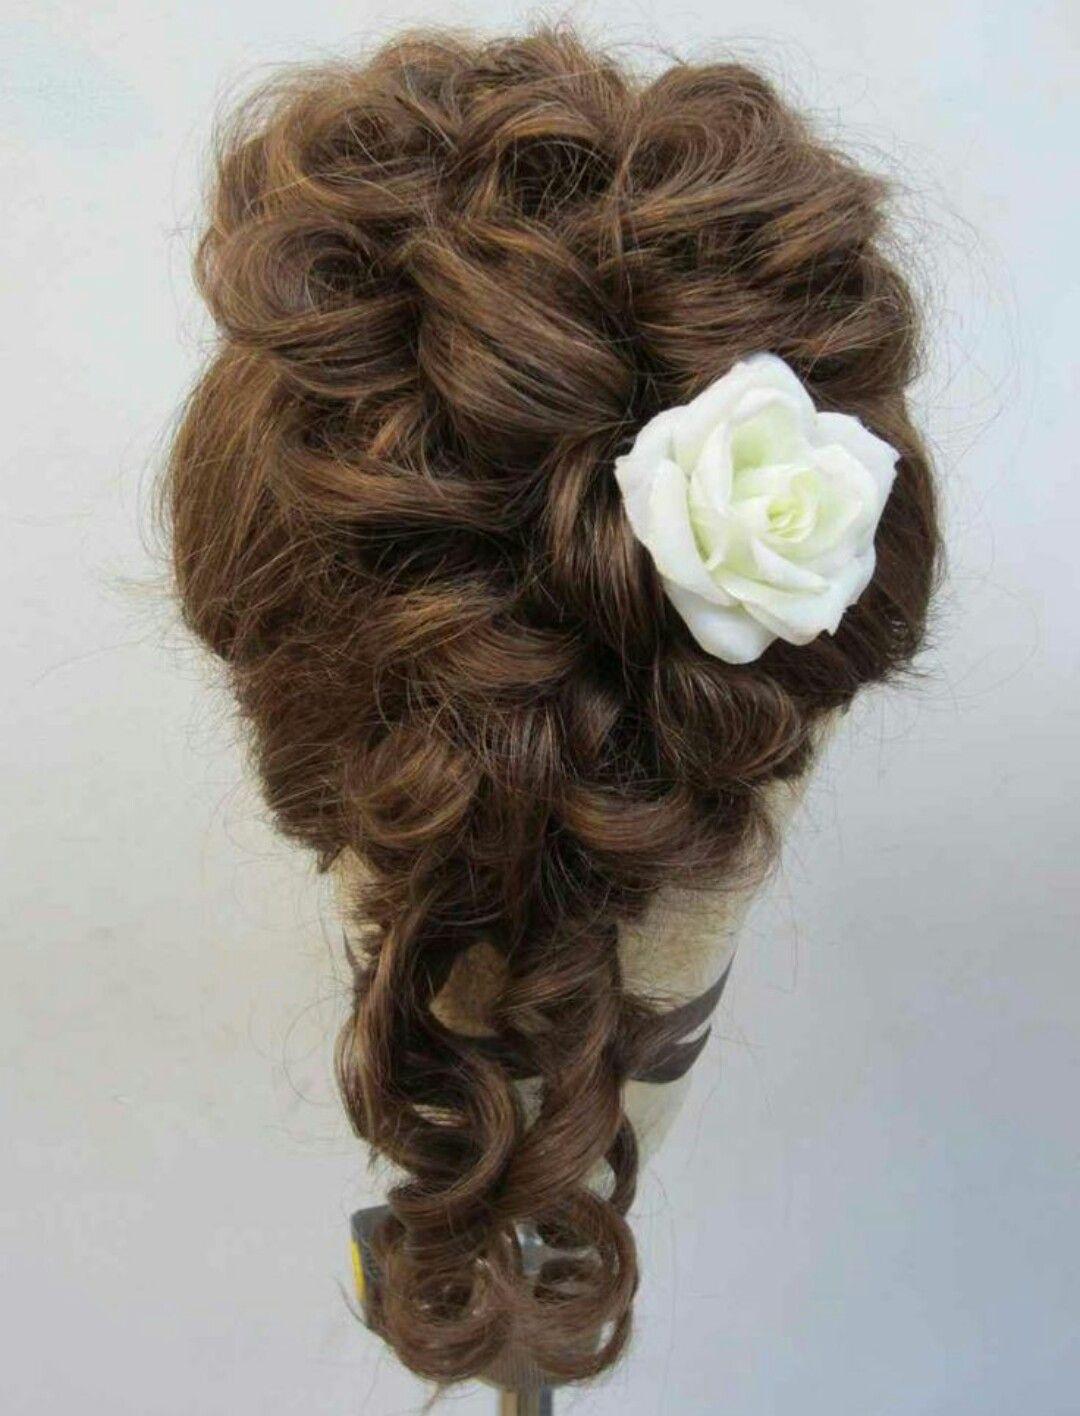 Victorian hairstyle Victorian hairstyles, Edwardian